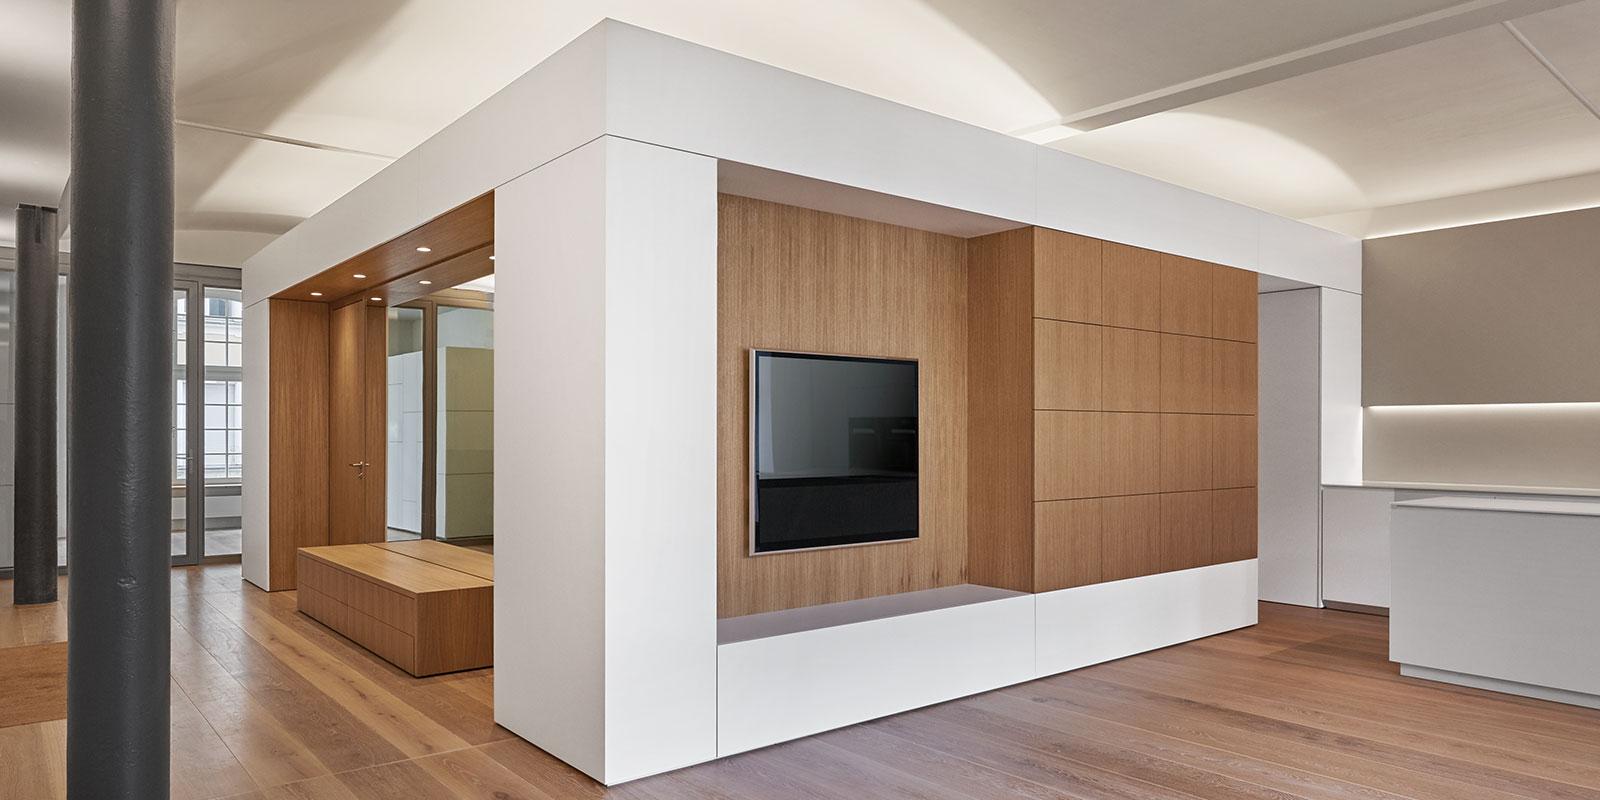 Loft Architektur loft g63 tru architekten